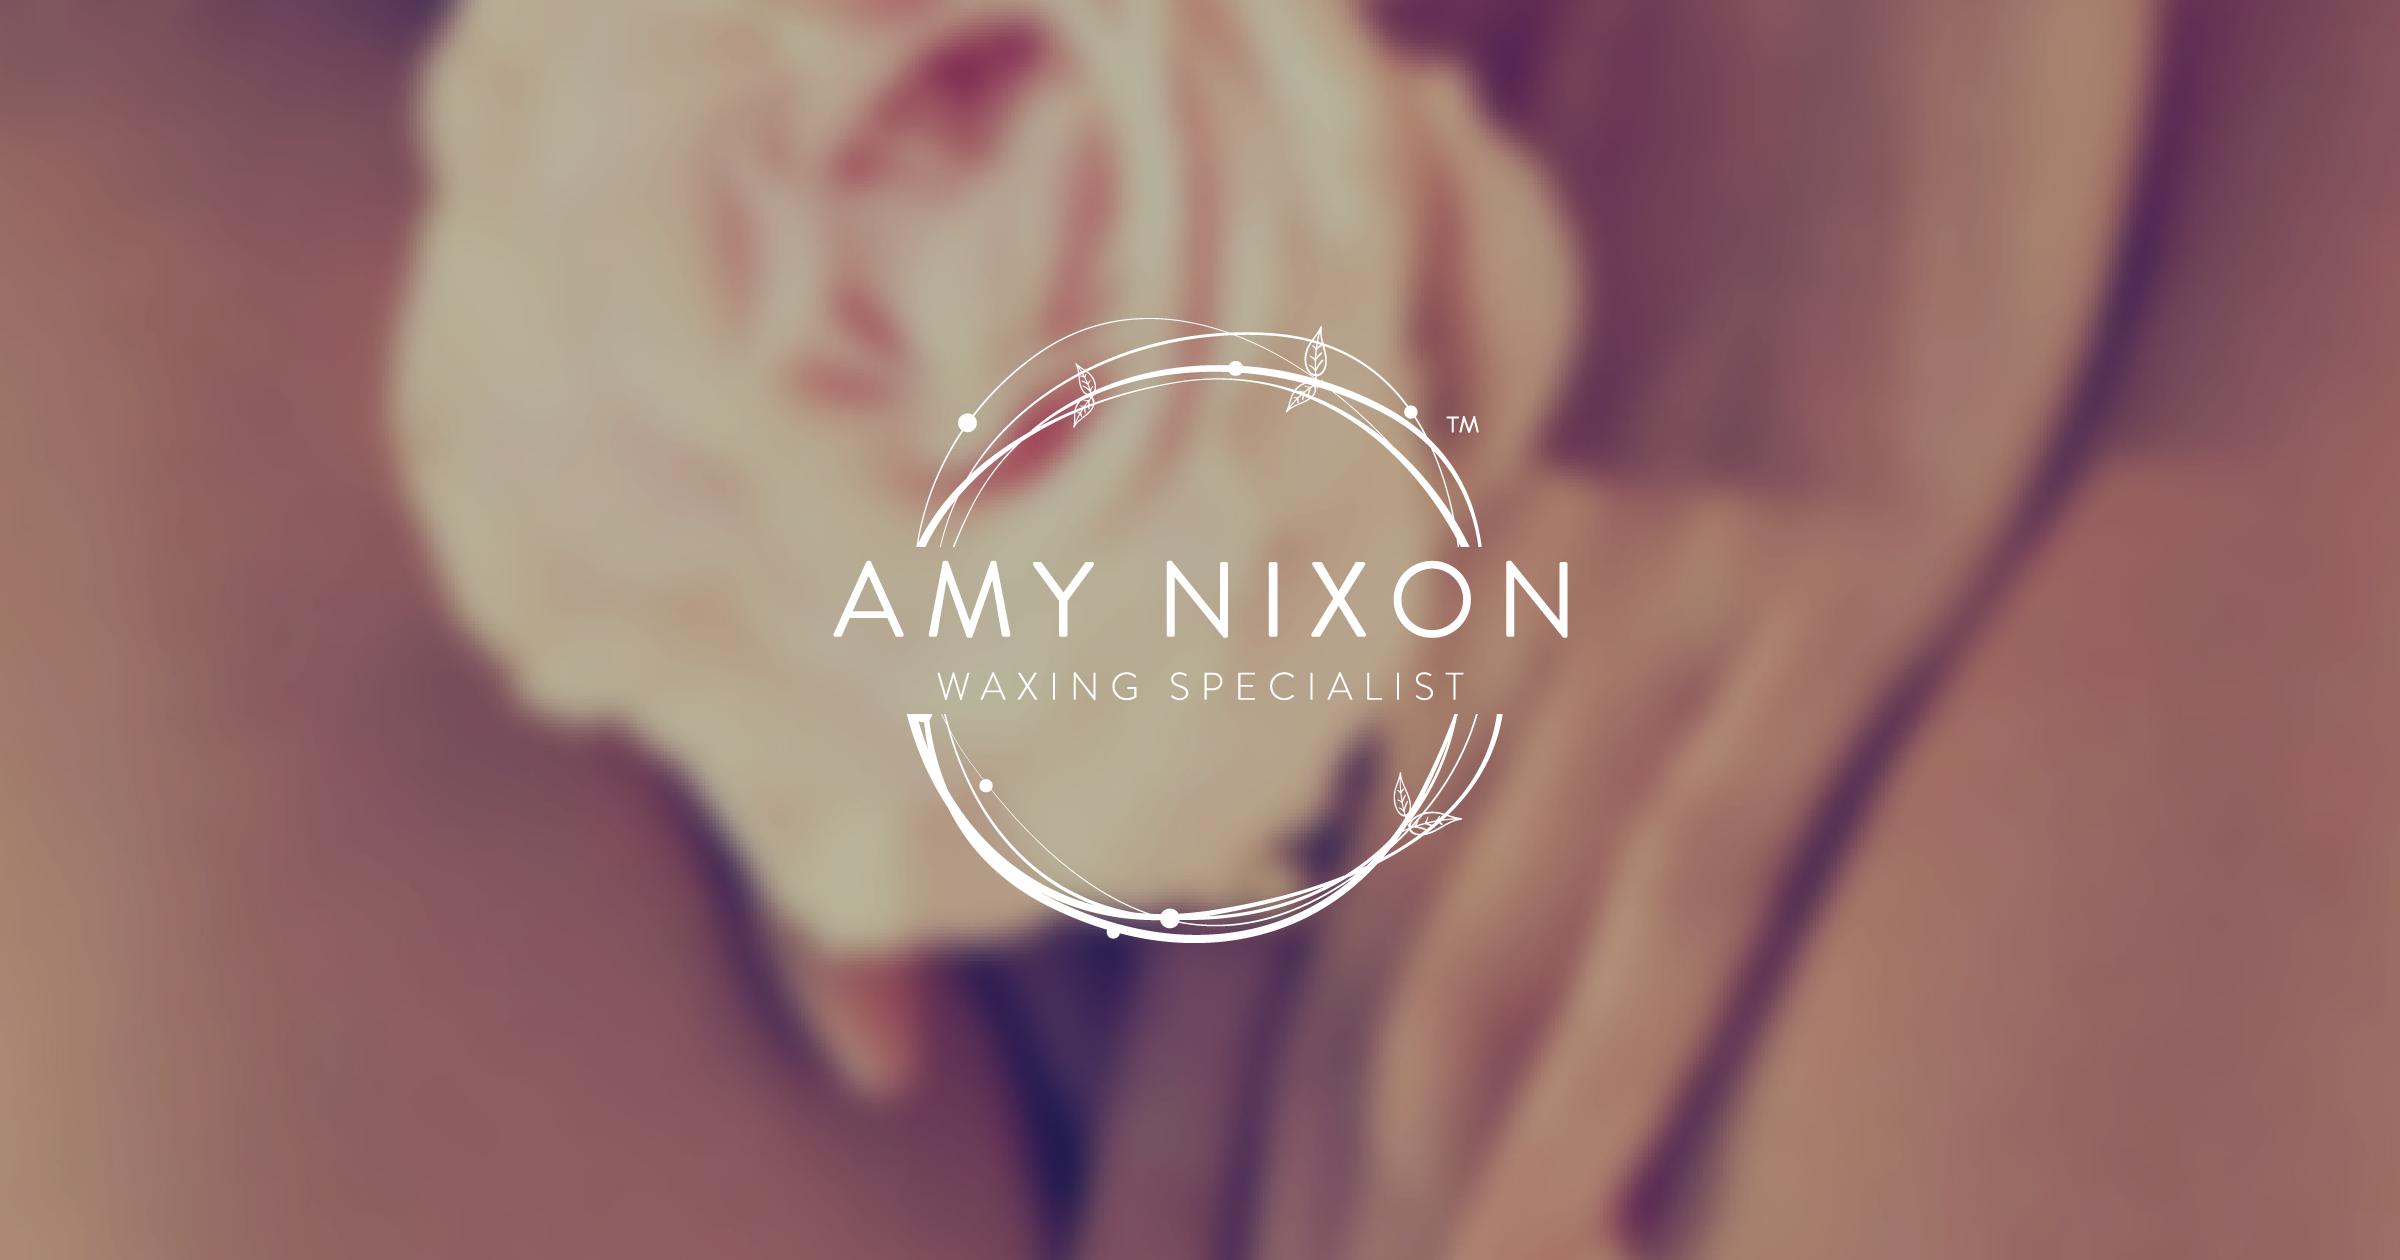 Amy Nixon brand